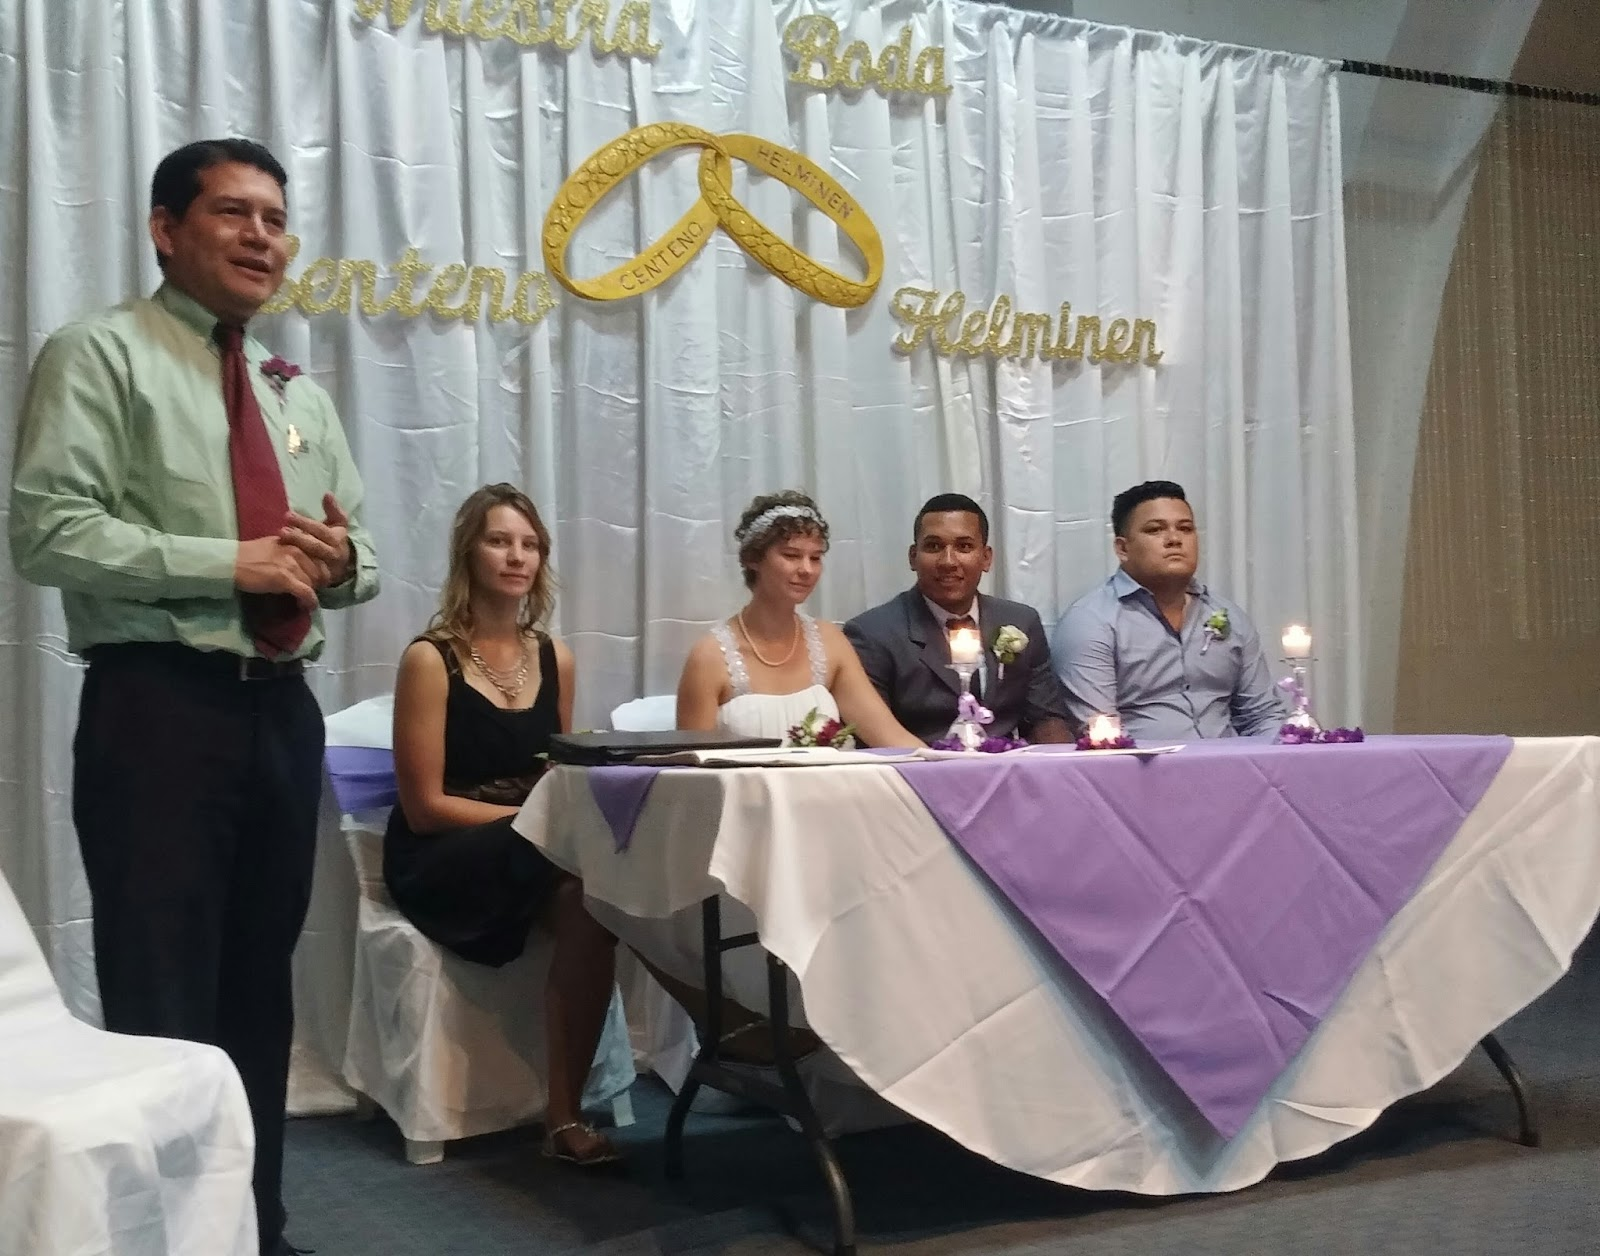 ... NICARAGUA FOR DARLENE HELMINEN'S WEDDING TO TOMAS ROJO..FEB. 13, 2016